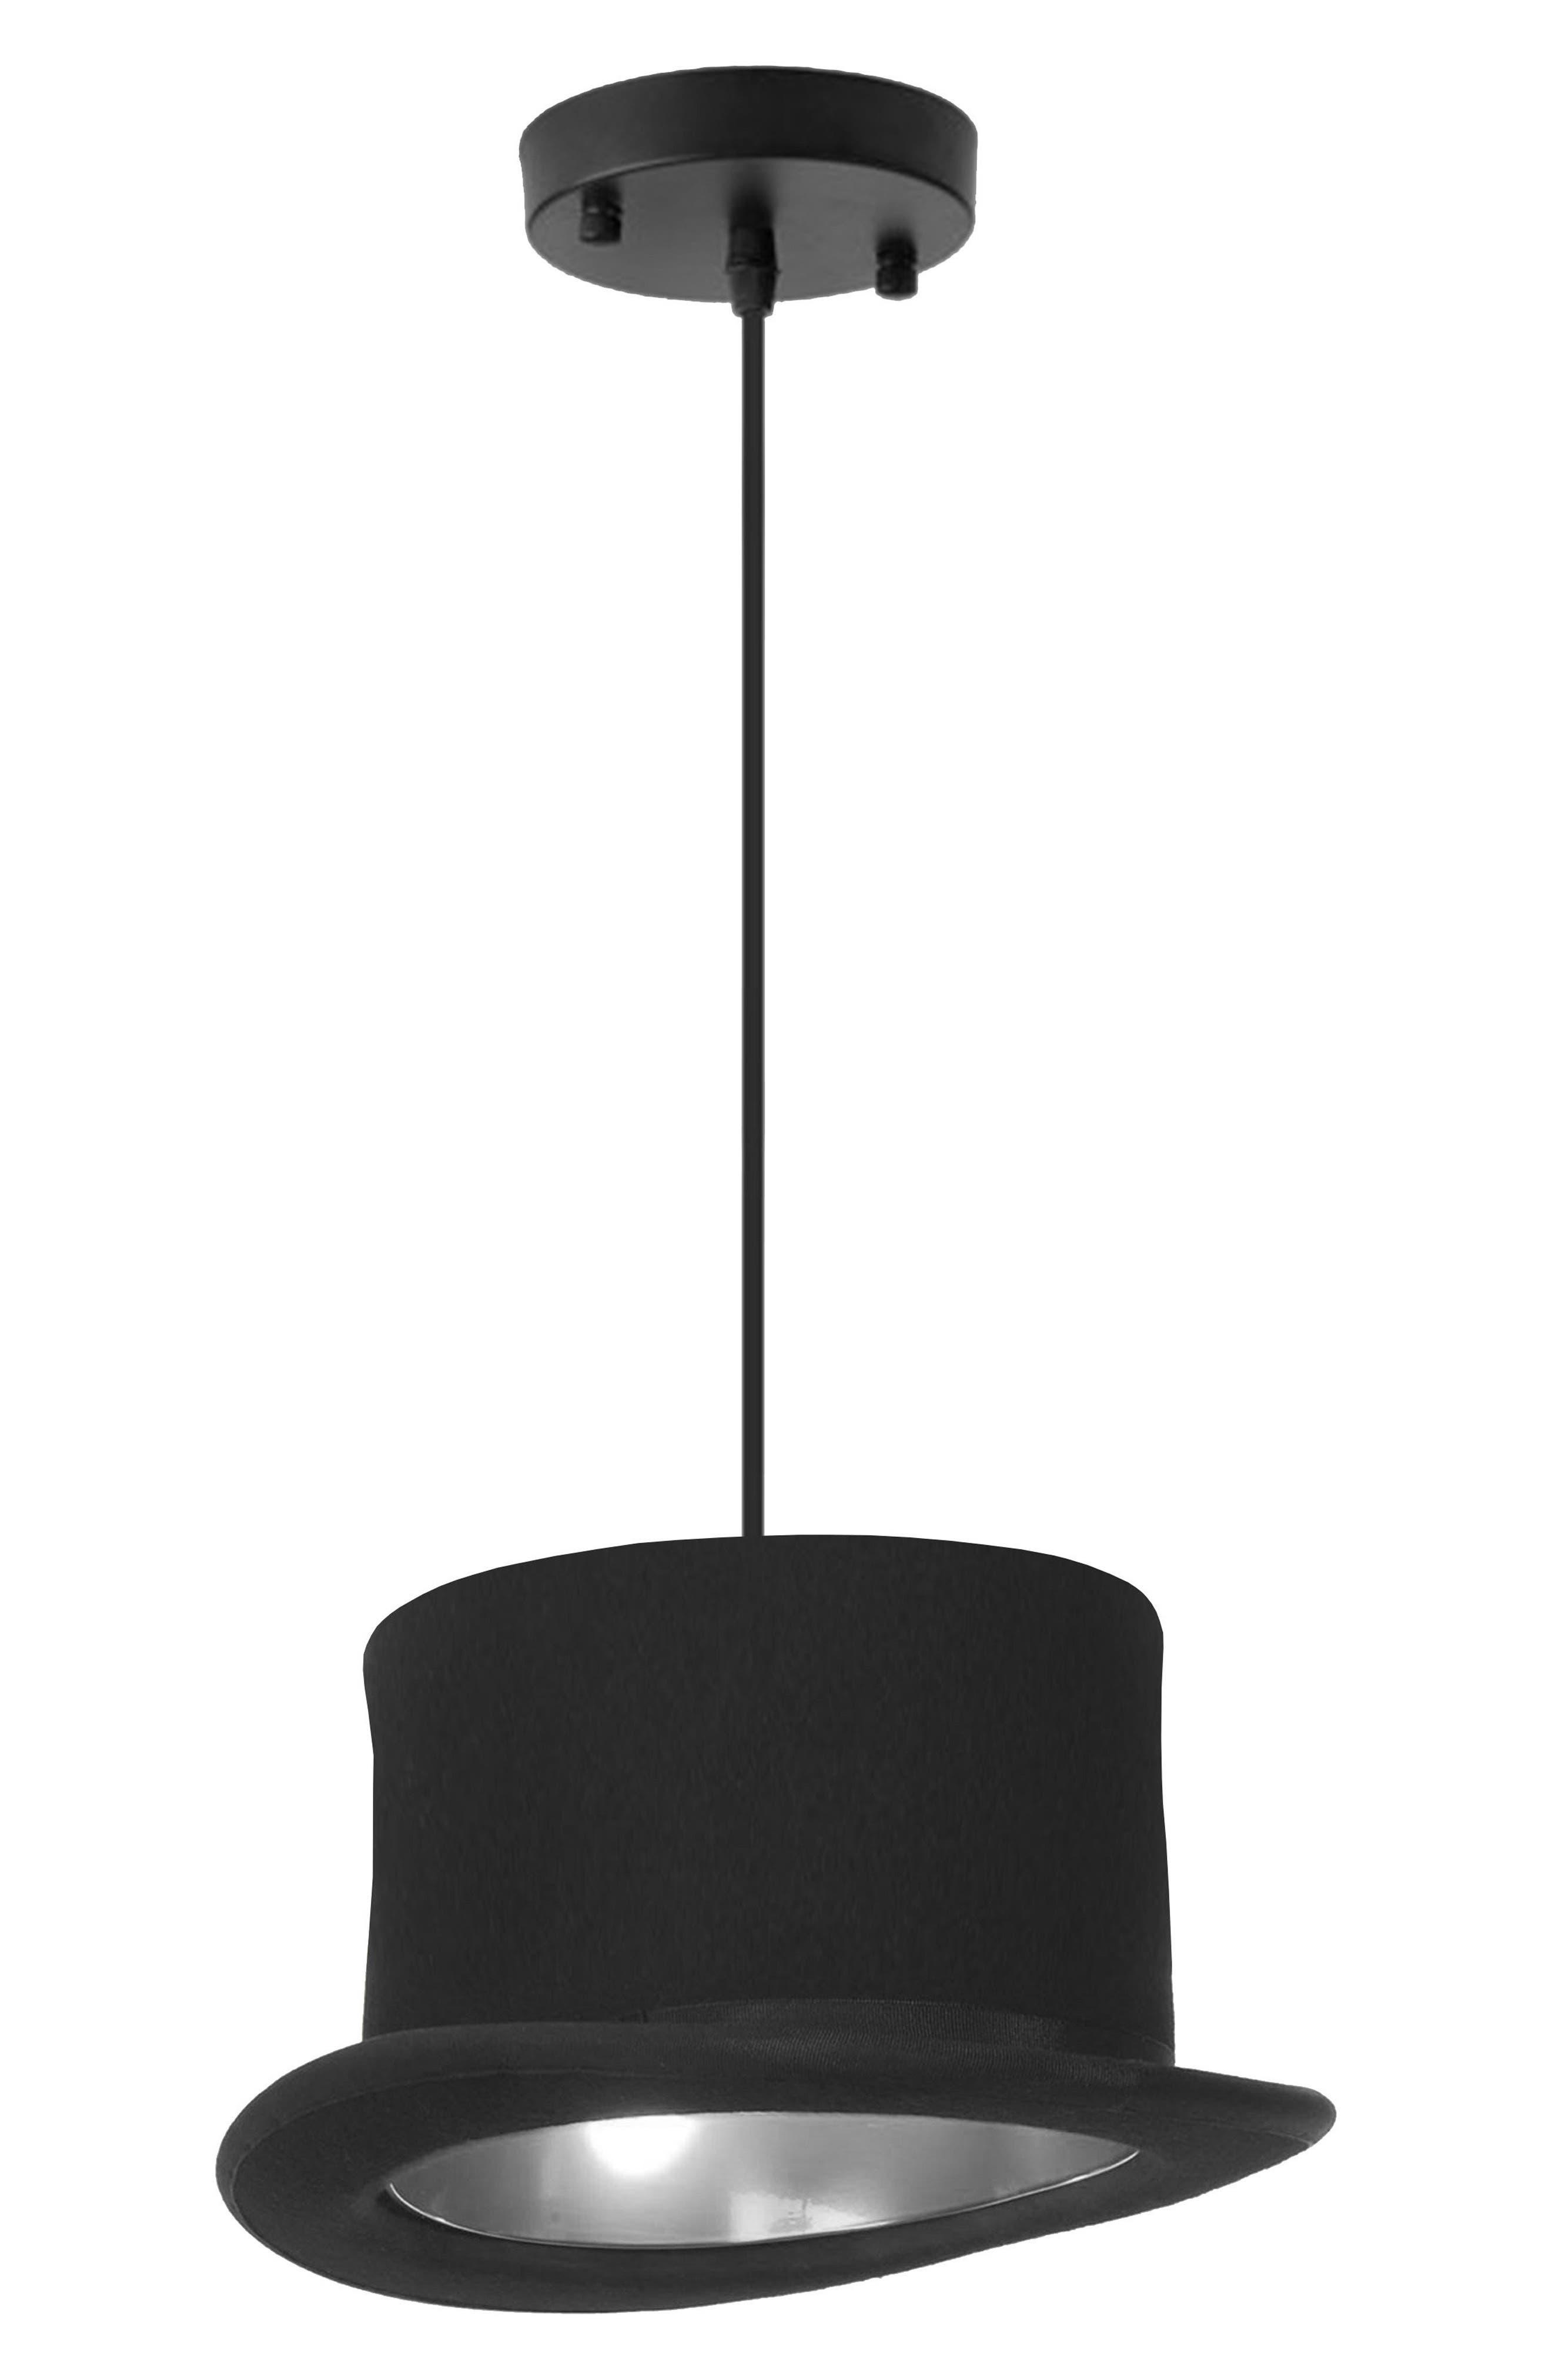 Langley Top Hat Ceiling Fixture,                         Main,                         color, 001